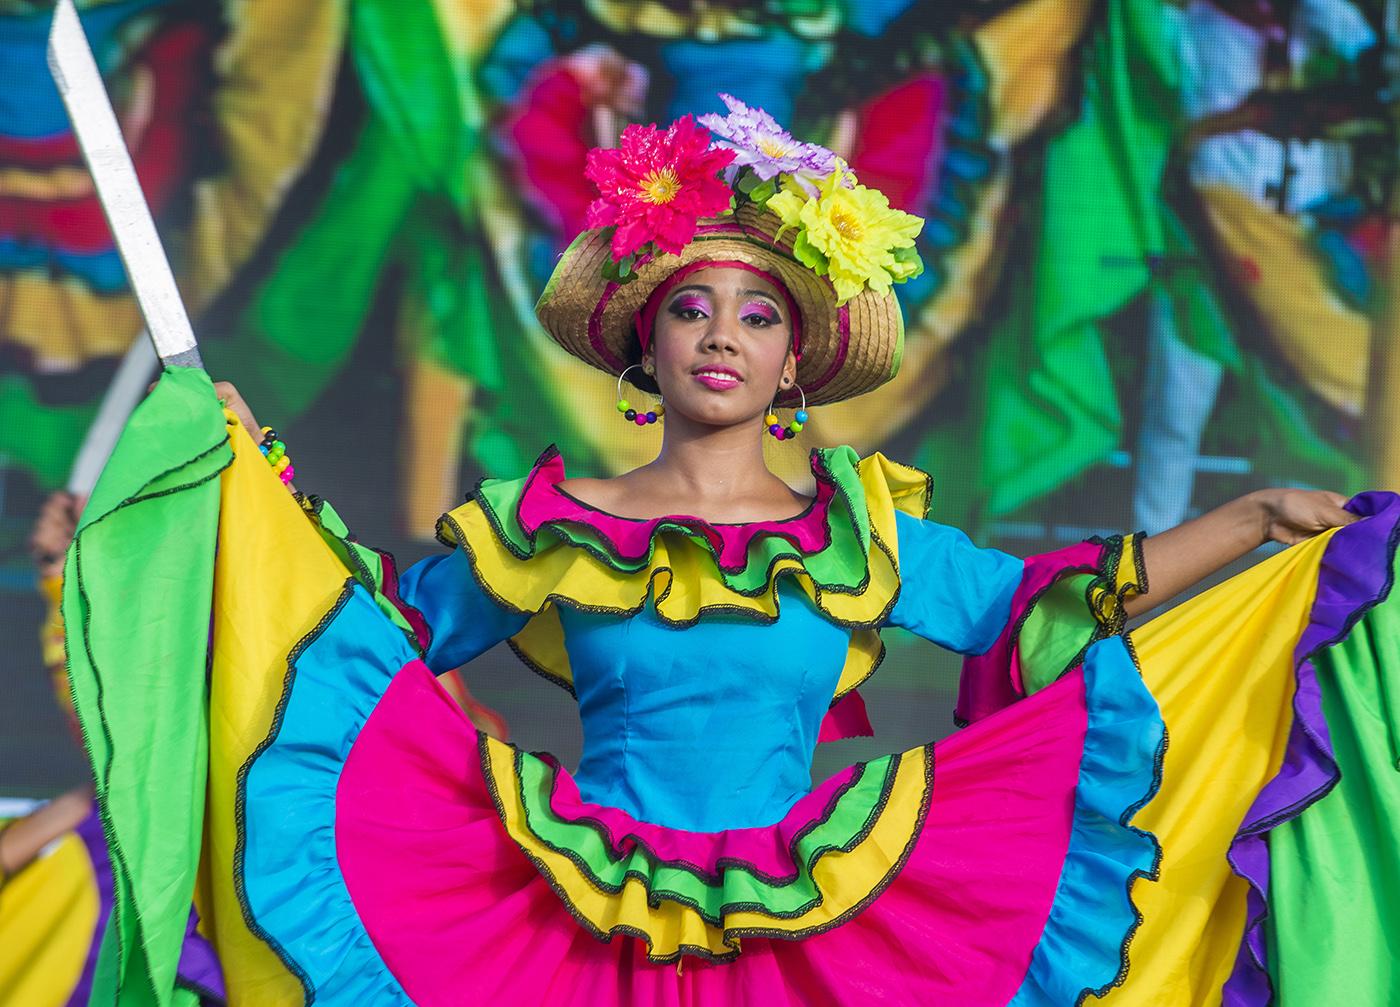 Revel_in_Colombias_Barranquilla_carnival